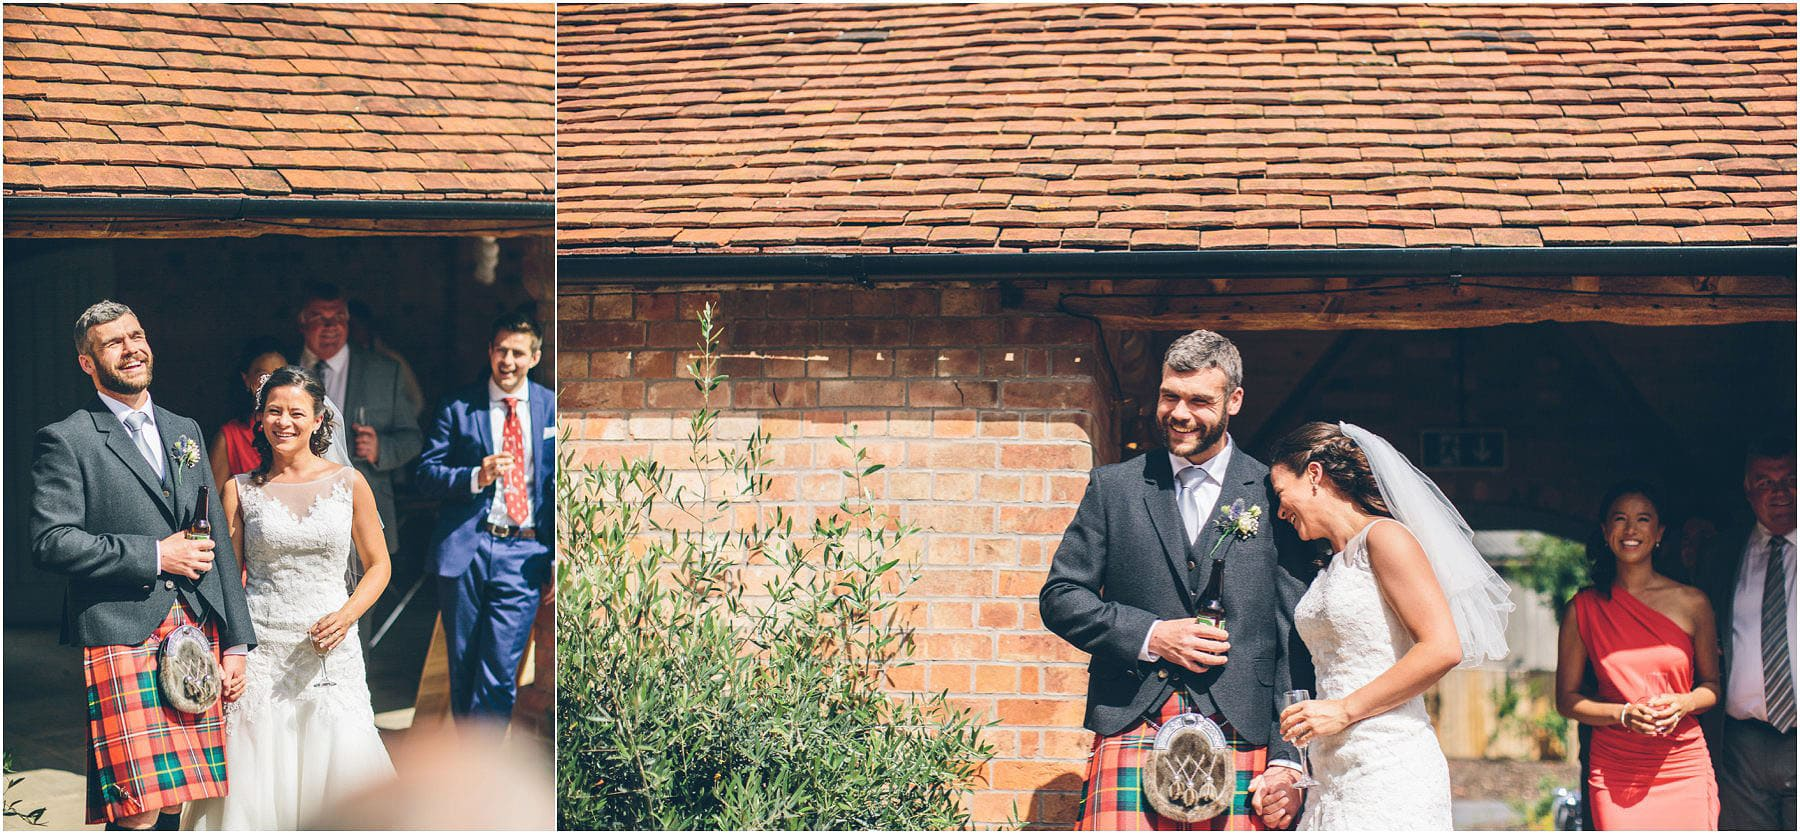 Swallows_Nest_Barn_Wedding_Photography_0122